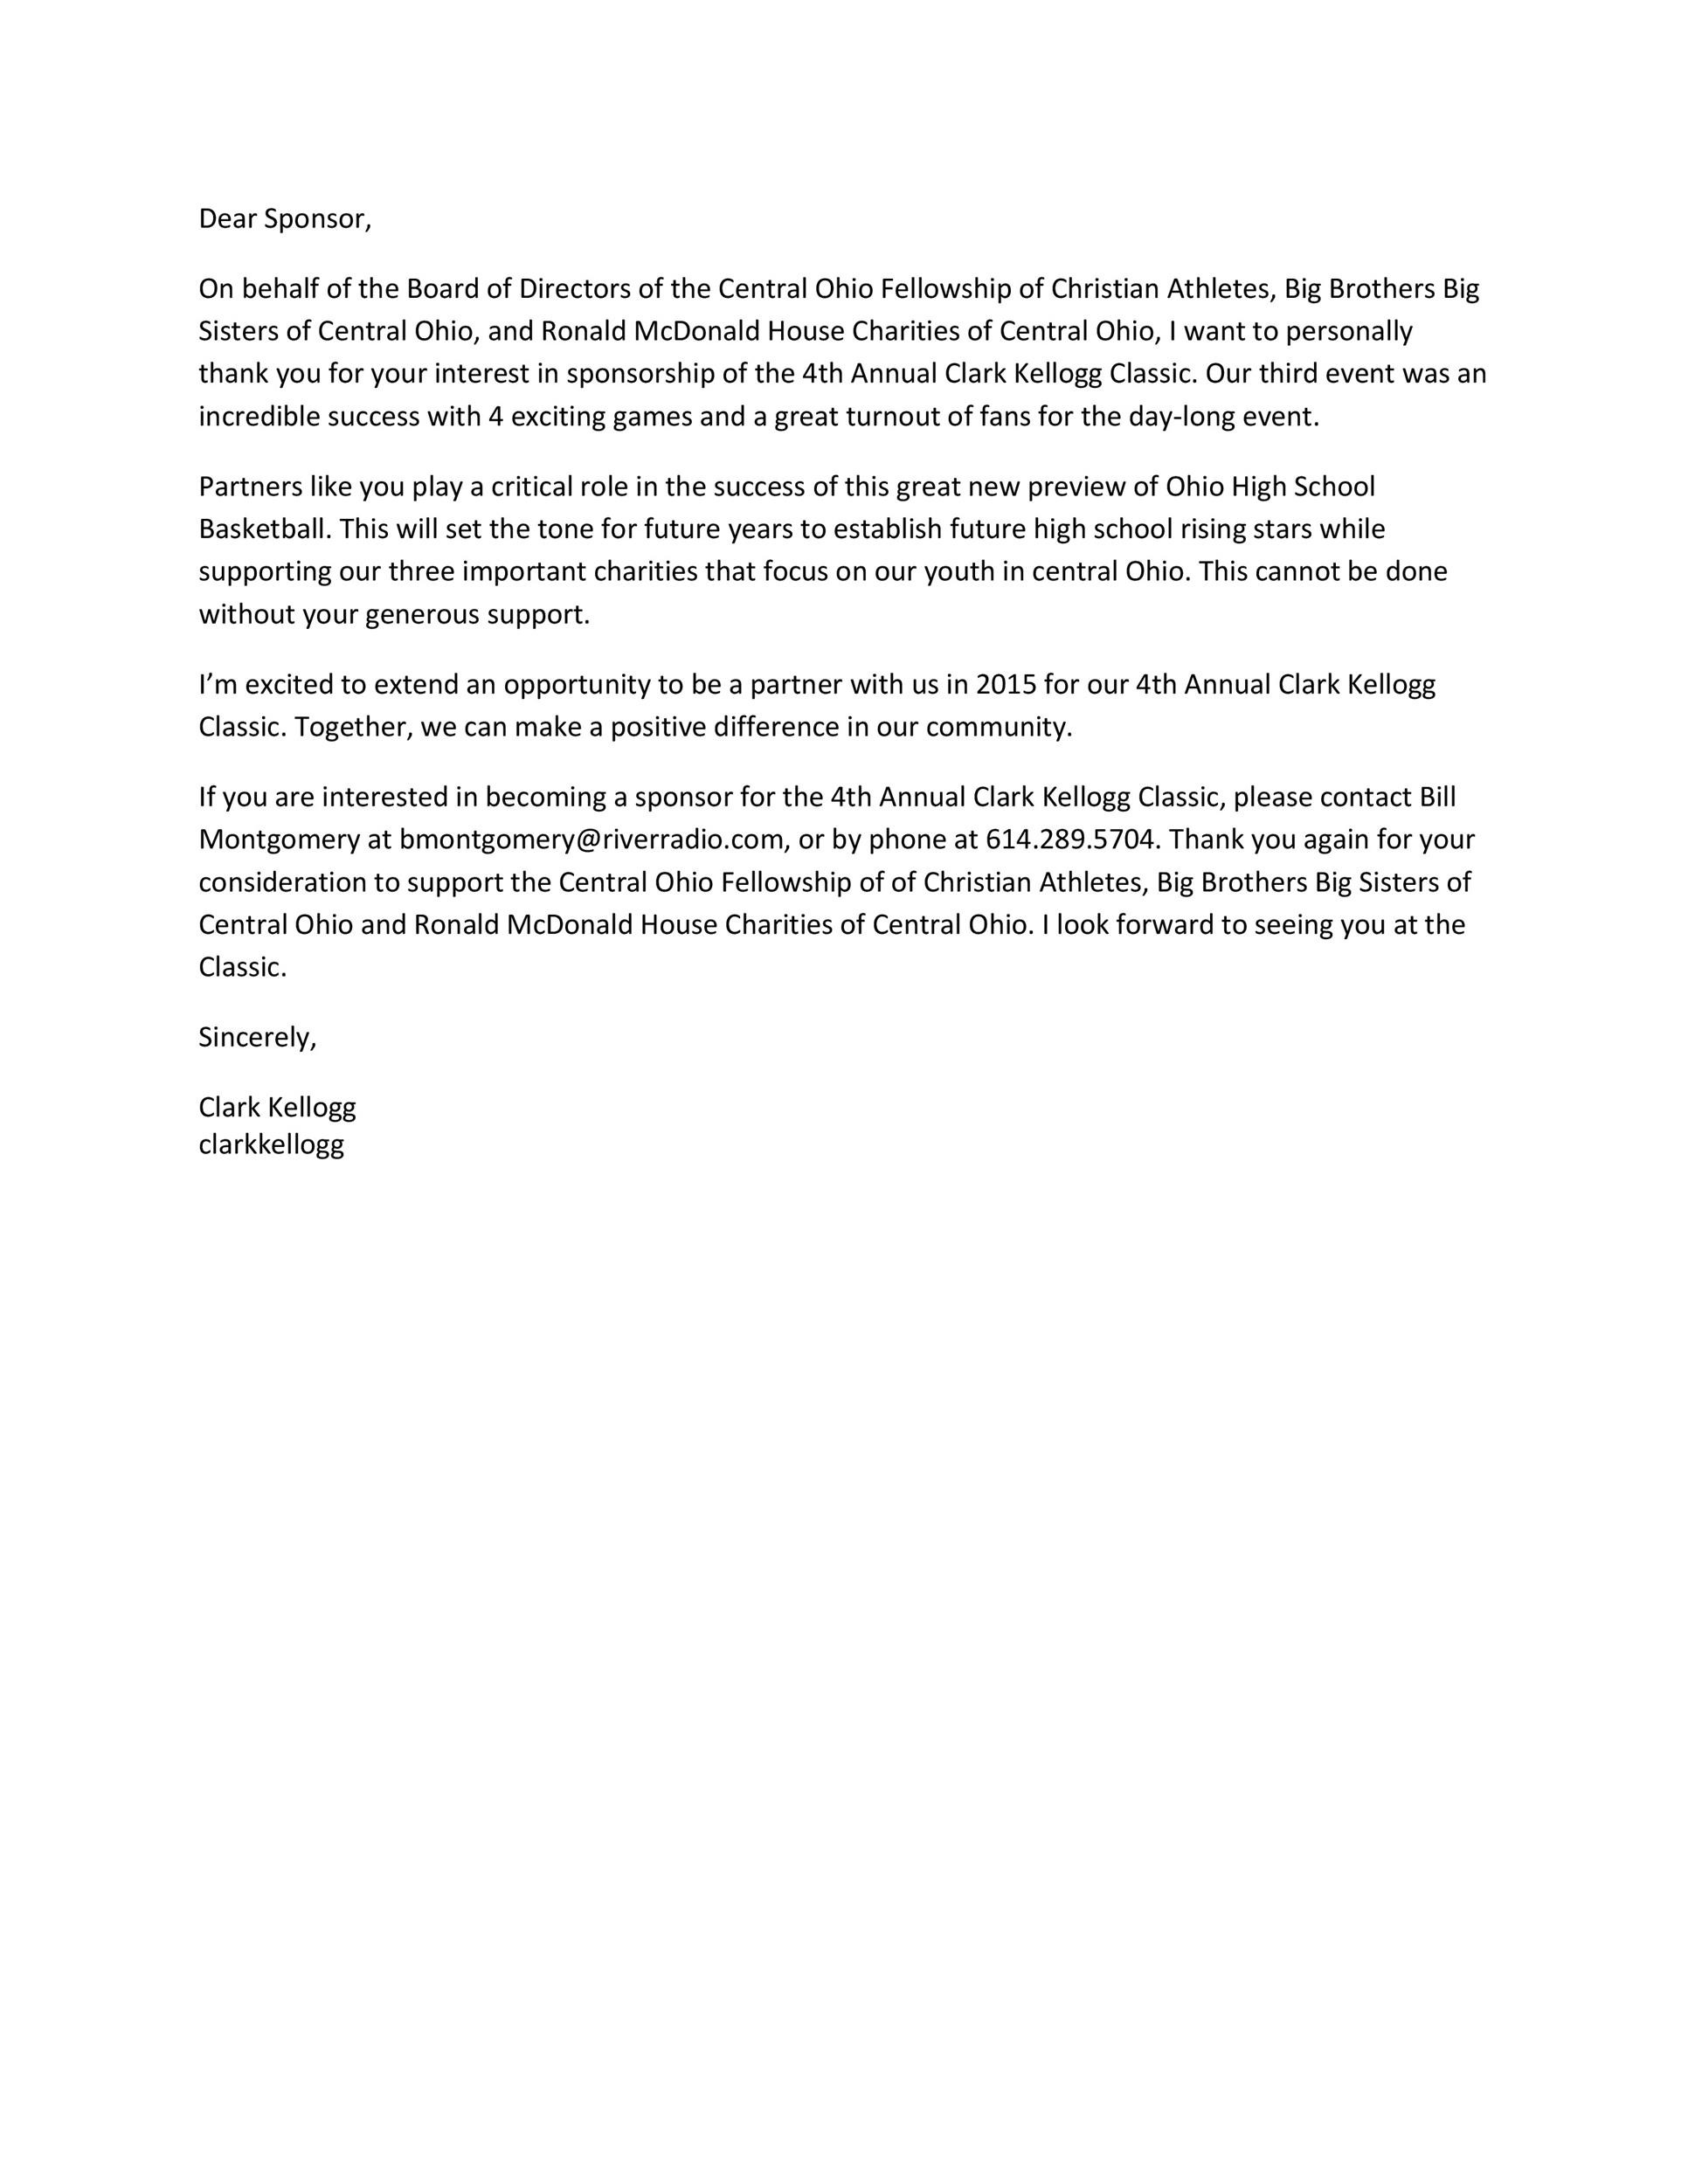 Free Sponsorship Letter Template 20